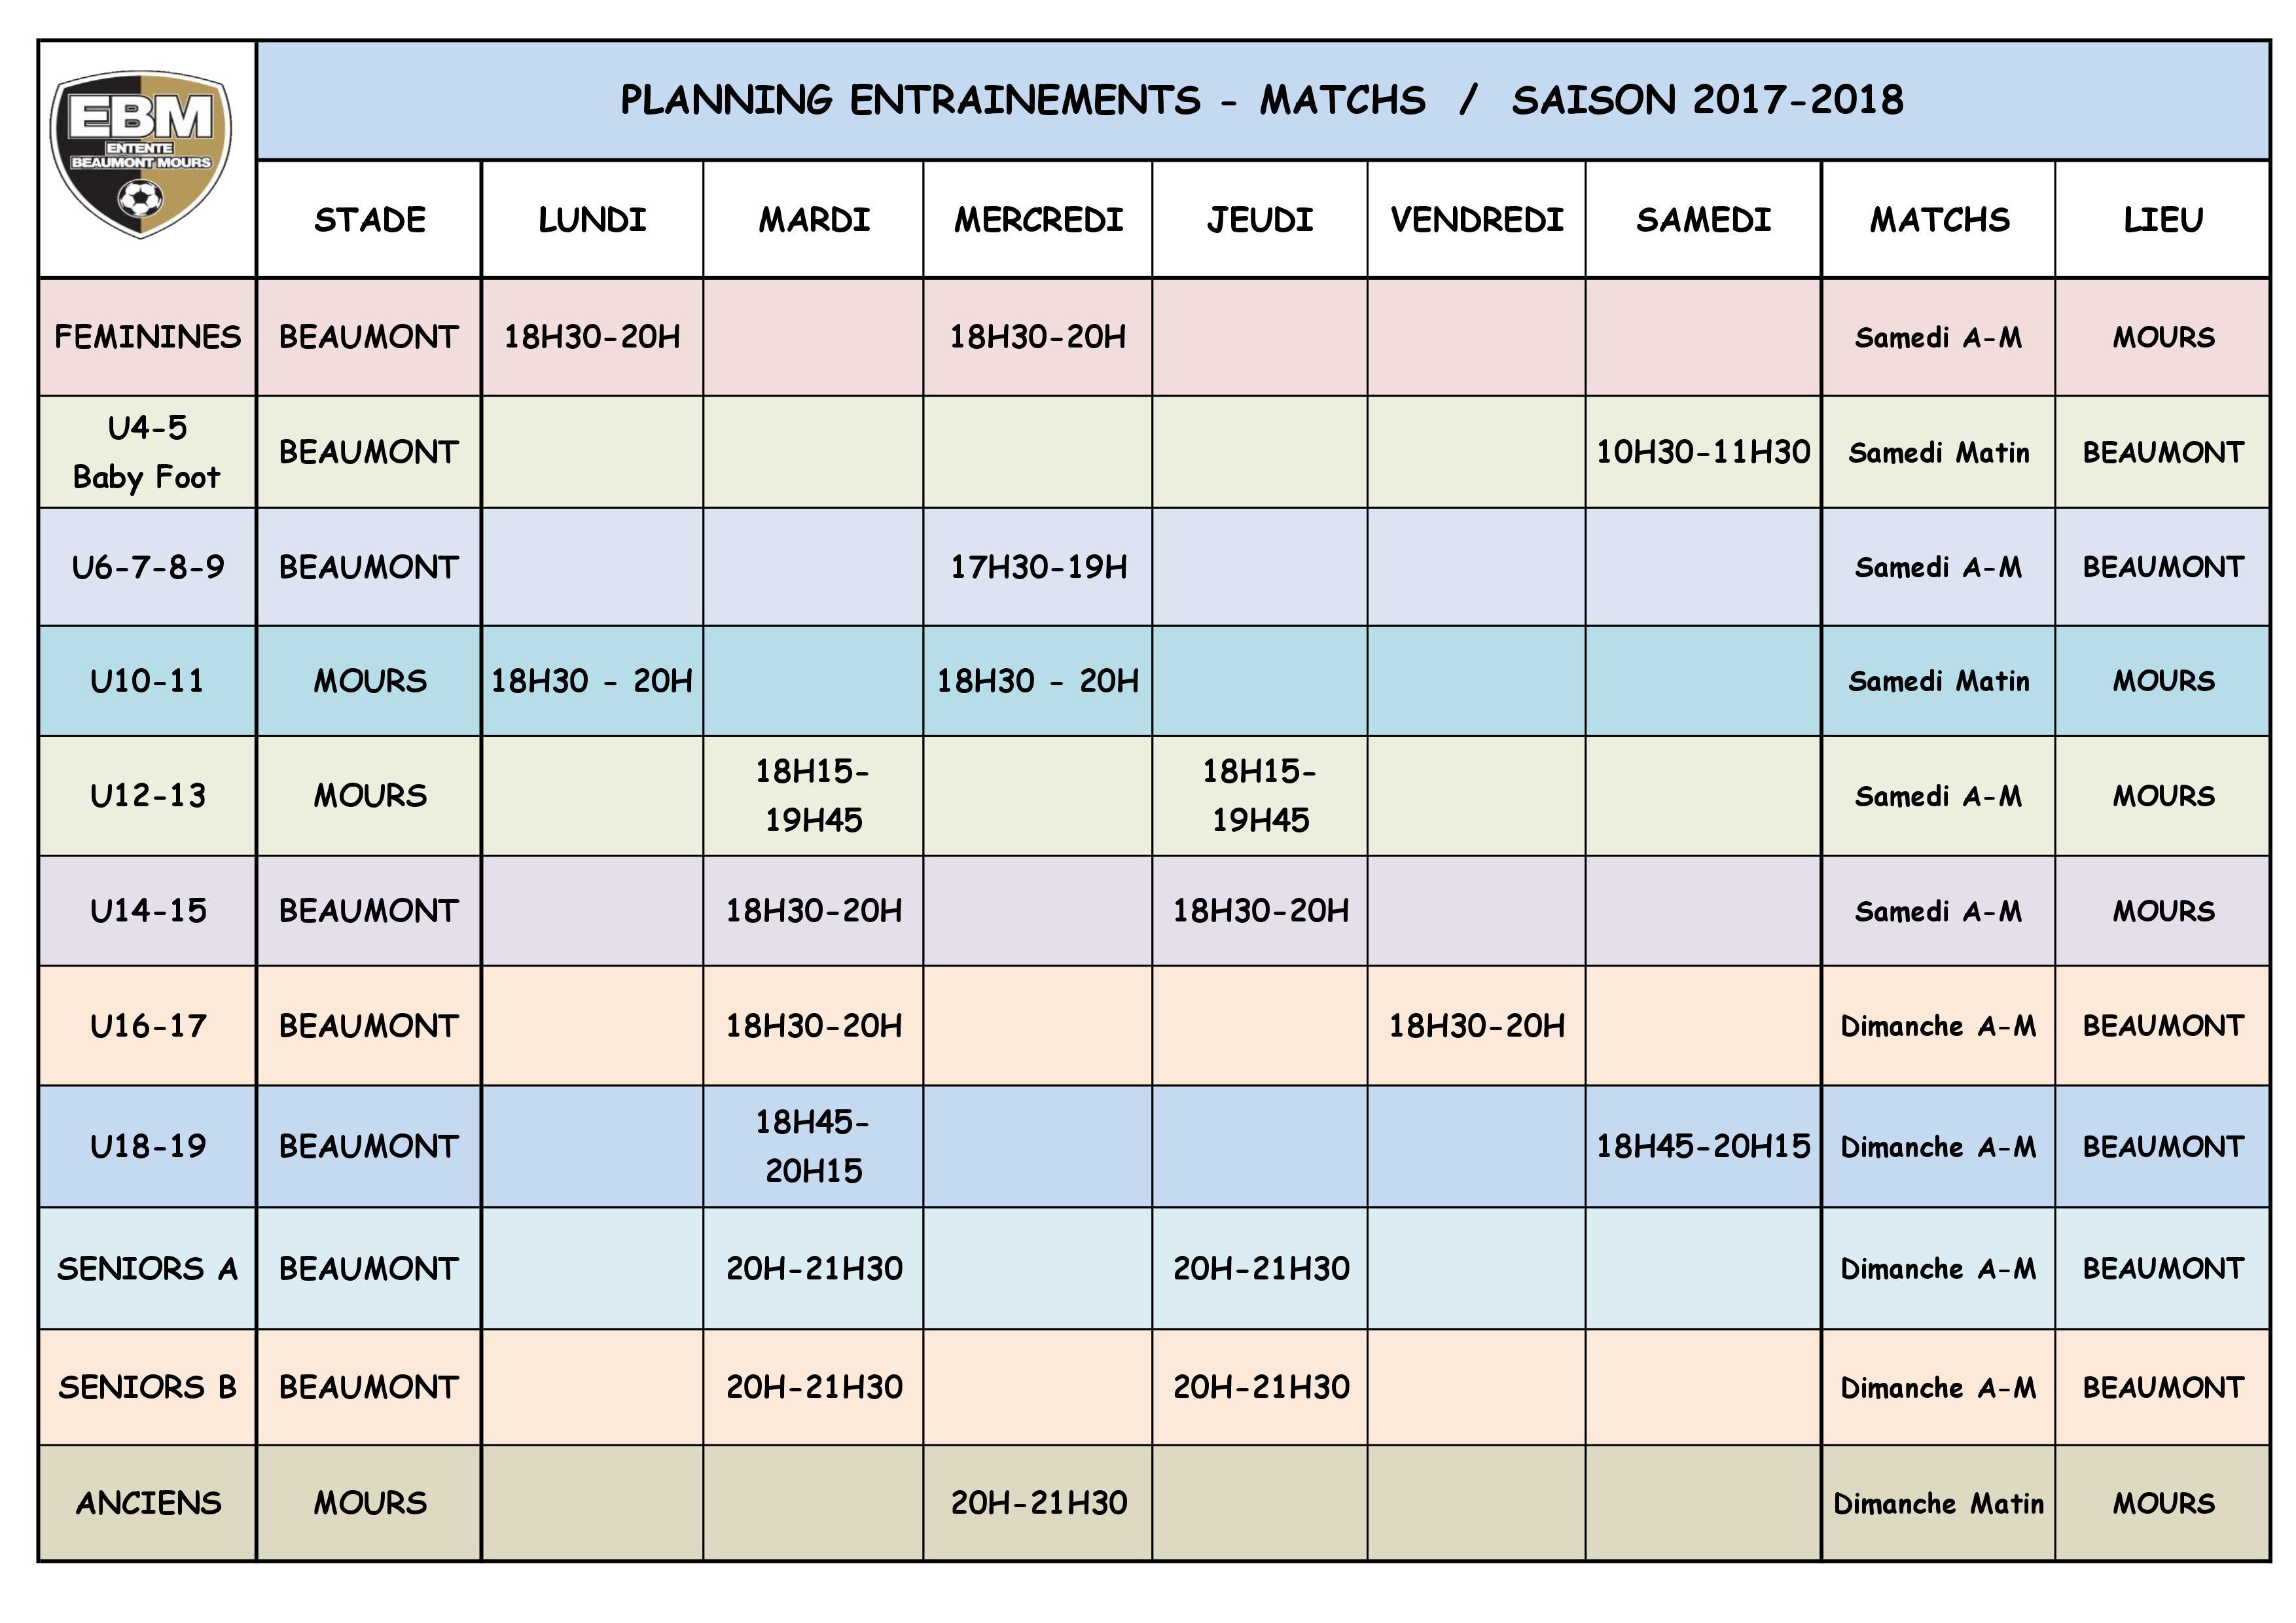 planning entrainements 17-18.jpg